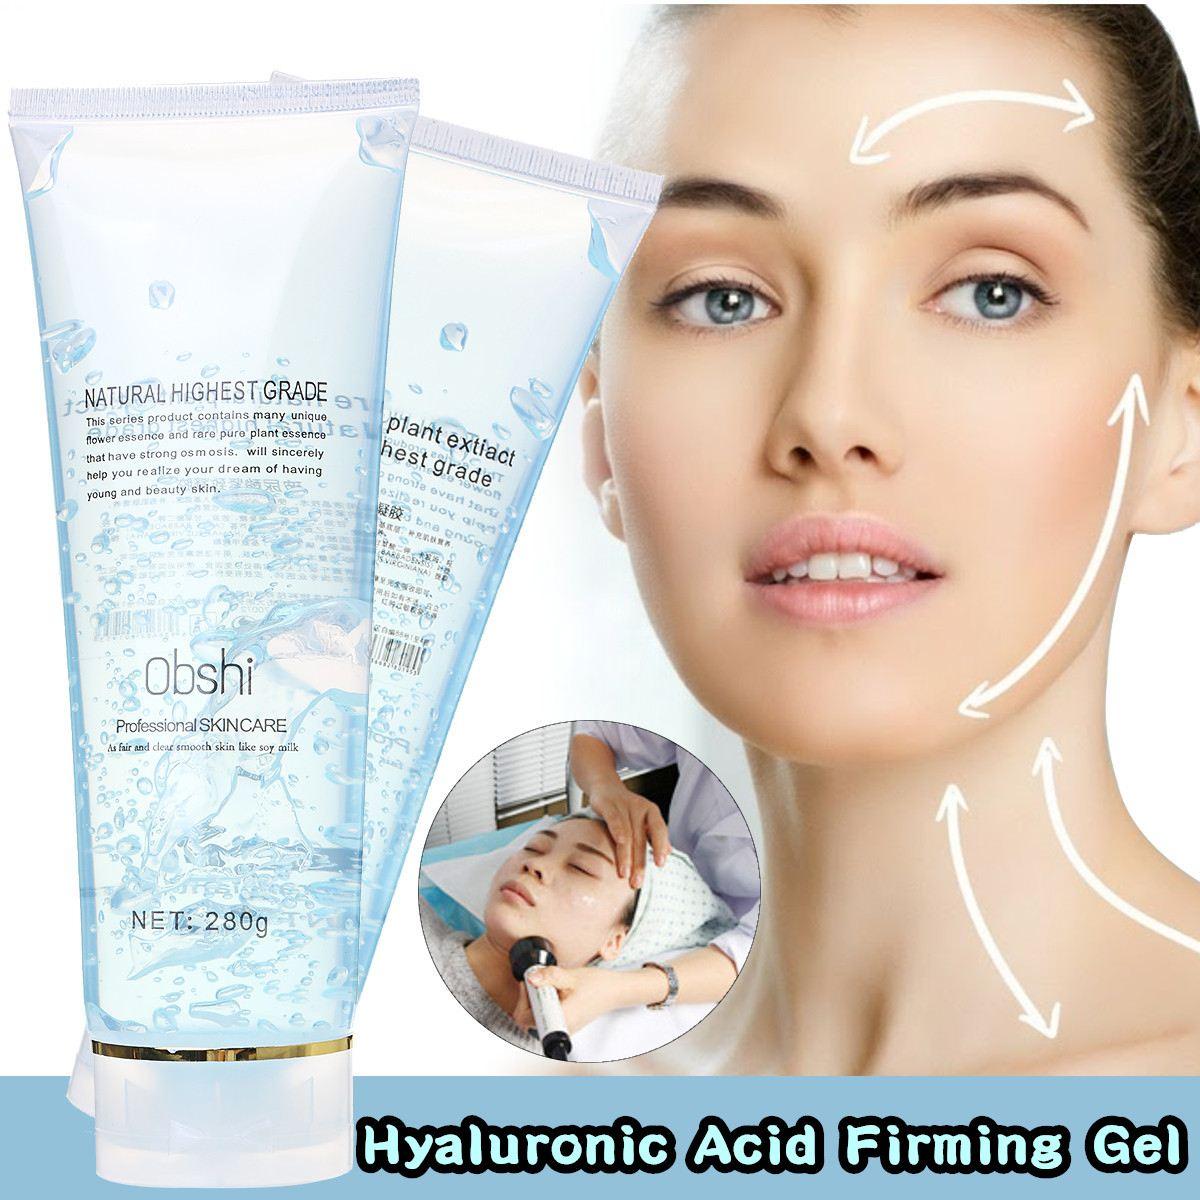 280 ml Ultrasonic RF Máquina Hidratante Gel Creme Injetar Gel Massageador Dispositivo Da Beleza Levantamento Aperte Rejuvenescimento Slimming Do Corpo